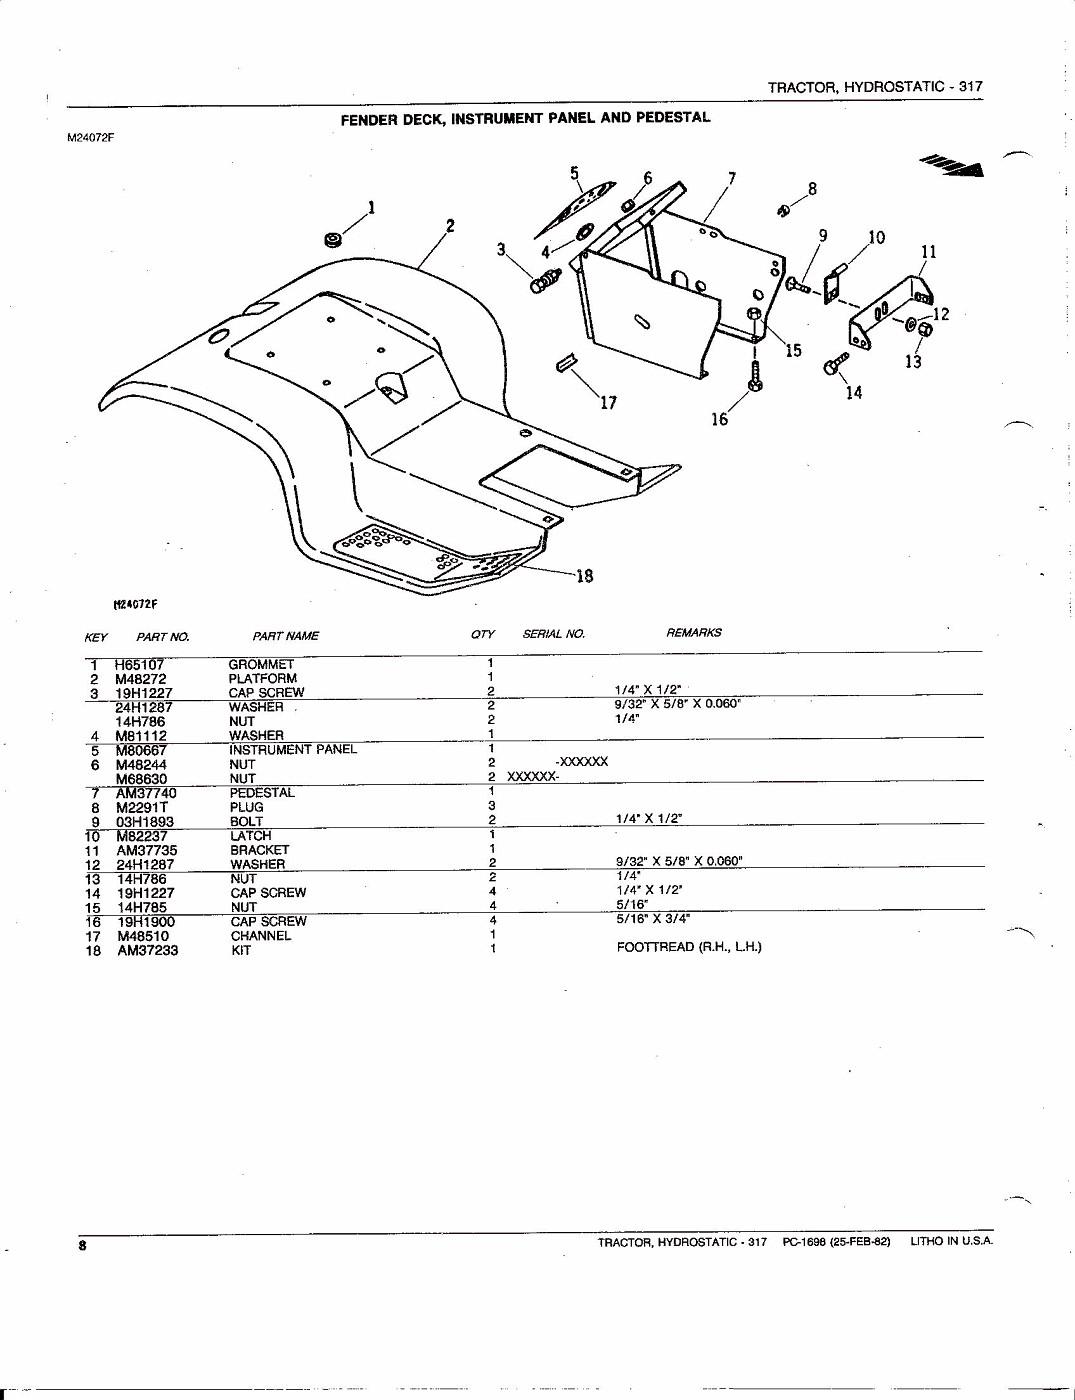 Photo John Deere 317 Hydrostatic Tractor Parts Catalog